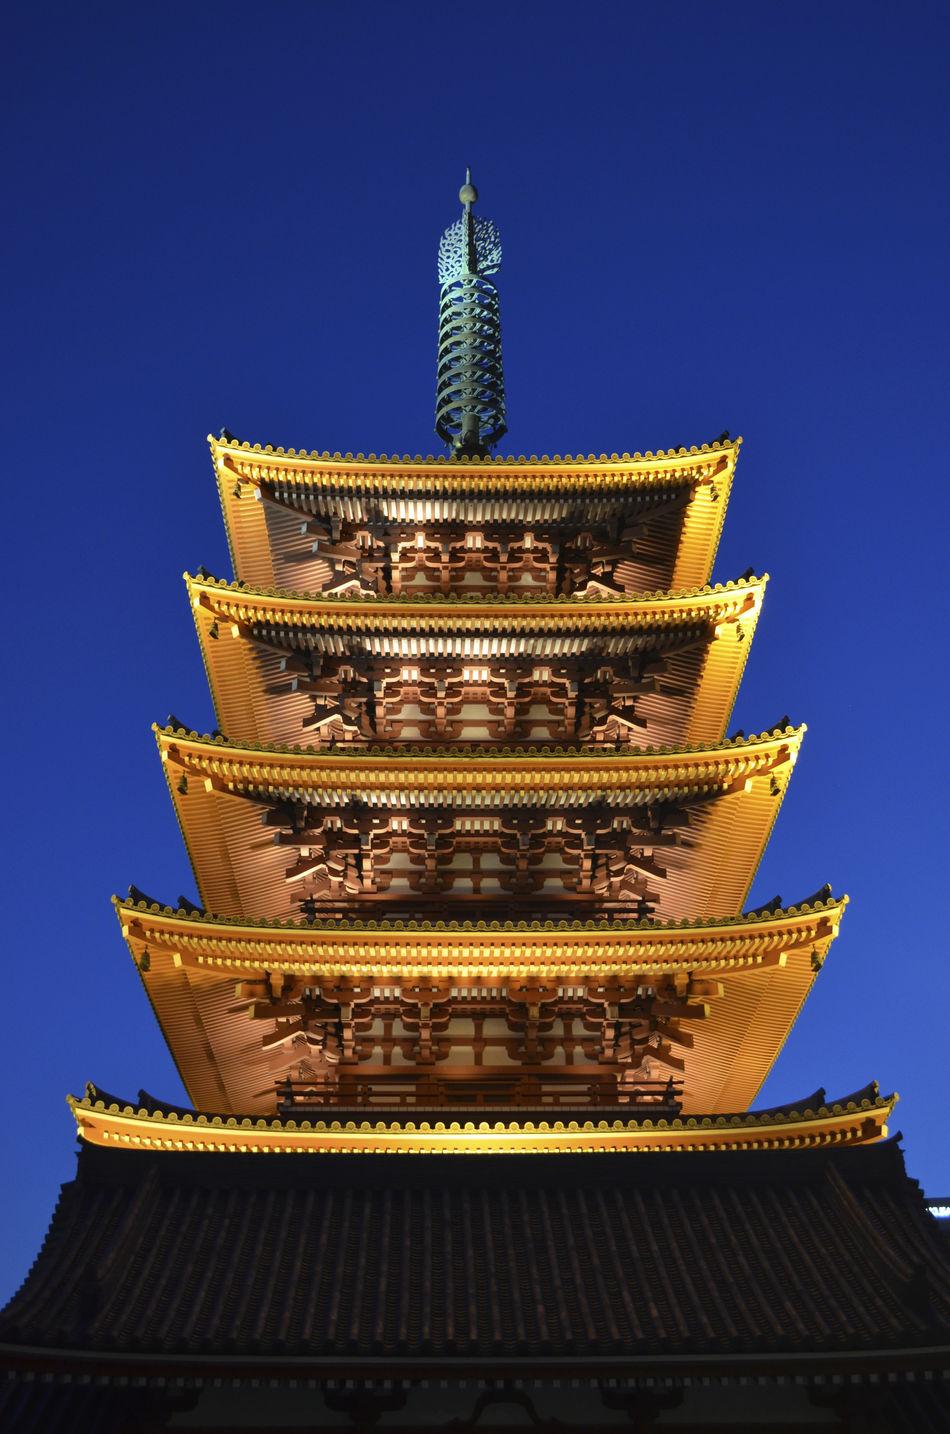 Ancient Architecture City Cultures Japan Japon Night Photography No People Outdoors Pagoda Pagode Religion Santuario Shrine Shrine Of Japan Temples Templo Tokio Tombeau Tourism Tradition Travel Destinations святыня باغودا معبد بوذي 寶塔